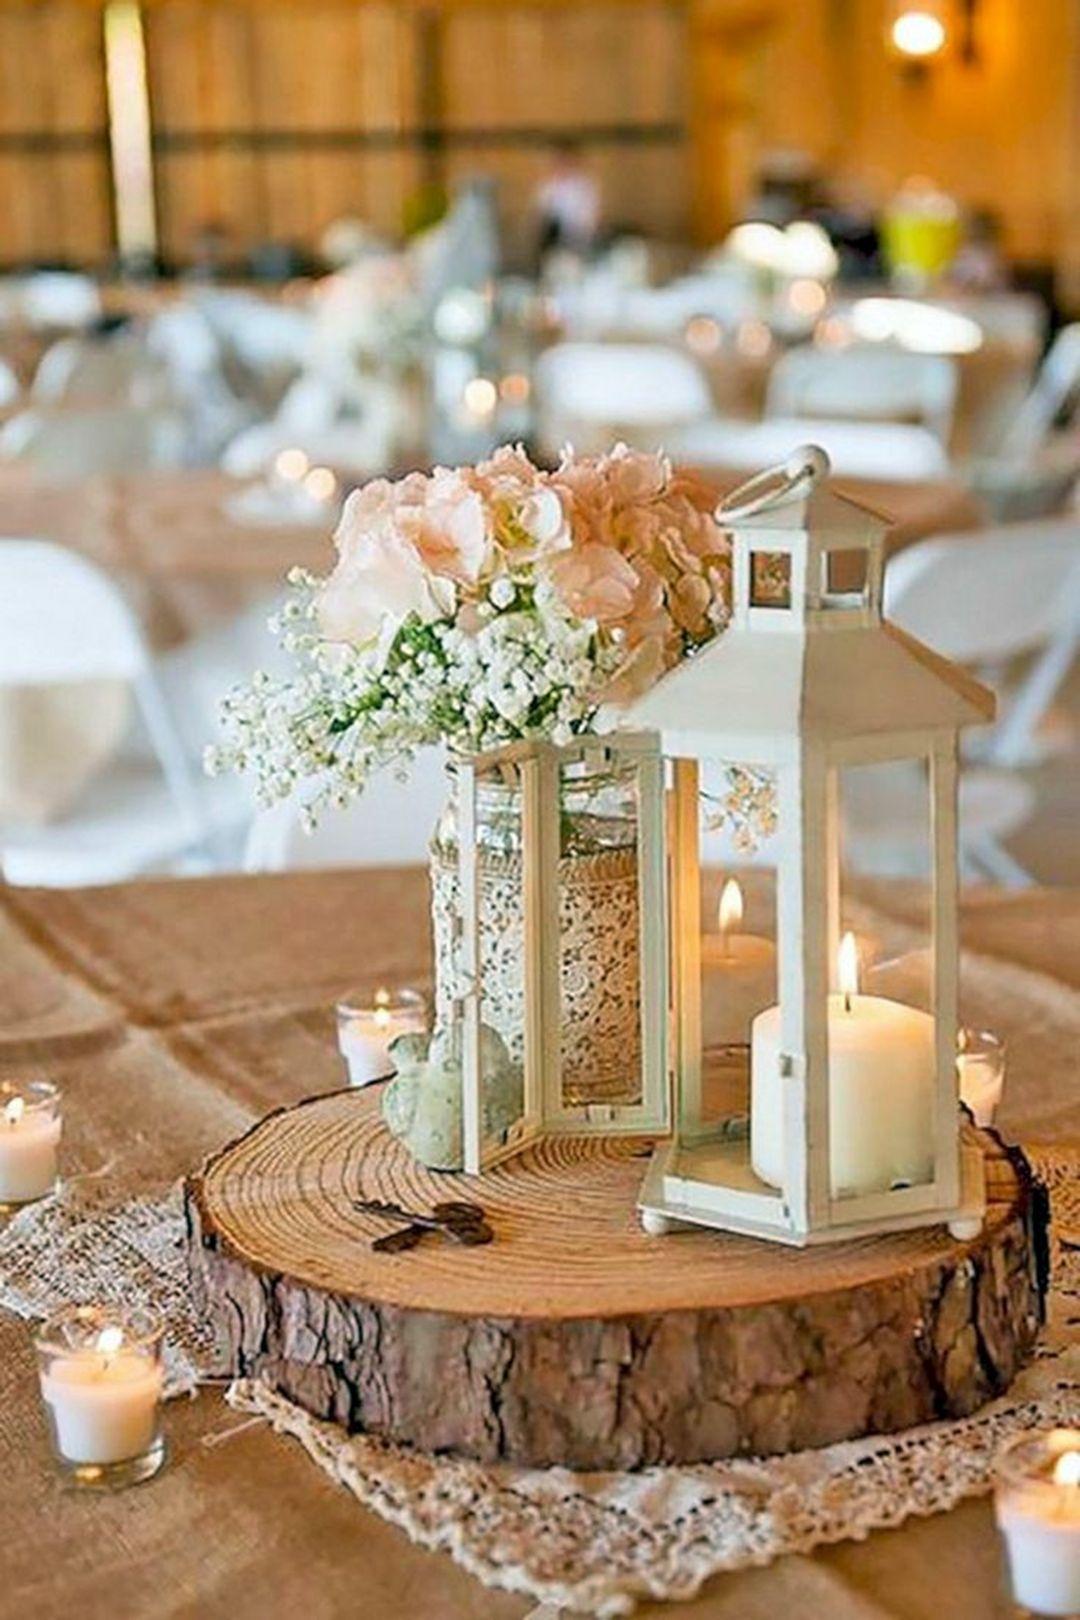 13 Wonderful Rustic Wedding Centerpieces Decor Ideas Fashions Nowadays In 2020 Flower Centerpieces Wedding Cheap Wedding Table Centerpieces Wedding Centerpieces Diy